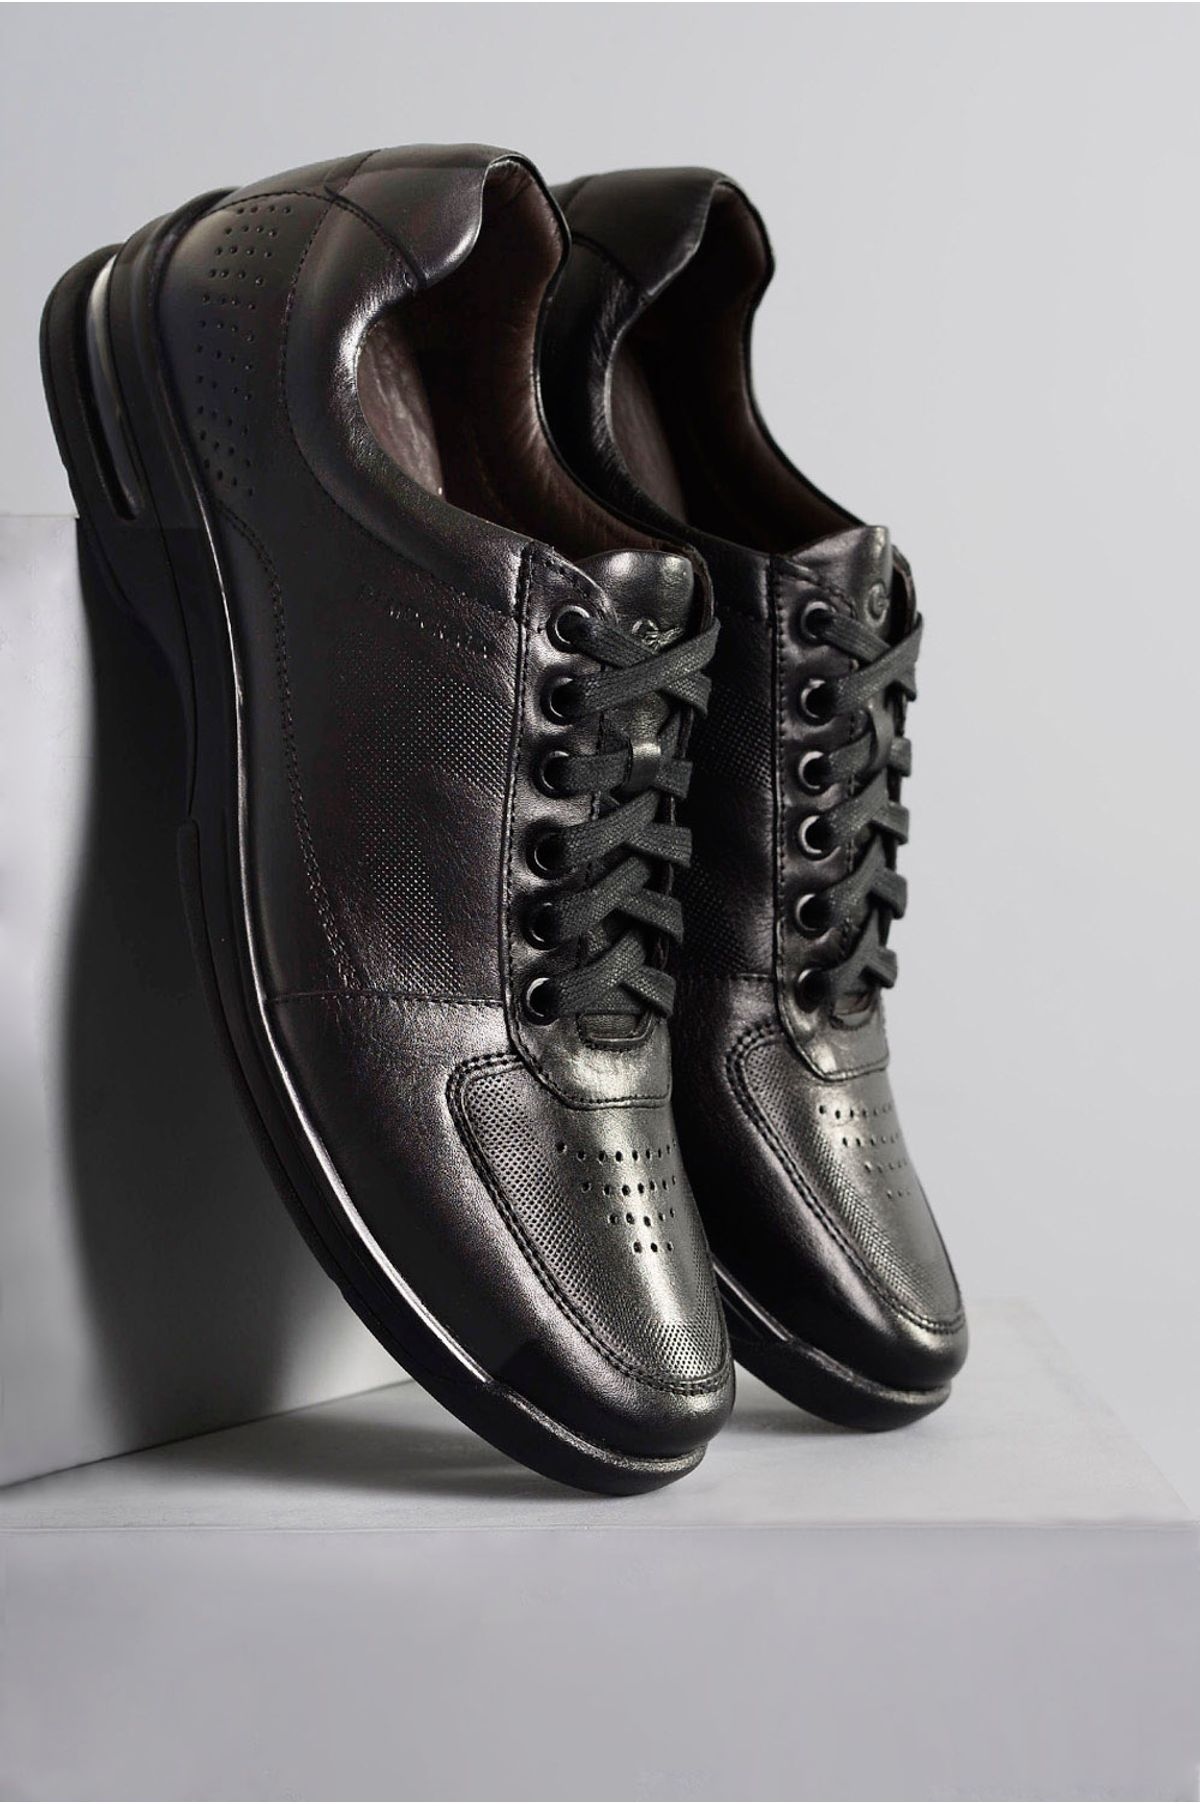 9824ecd7a Sapato Masculino Social Democrata Air Gel PRETO - Mundial Calçados